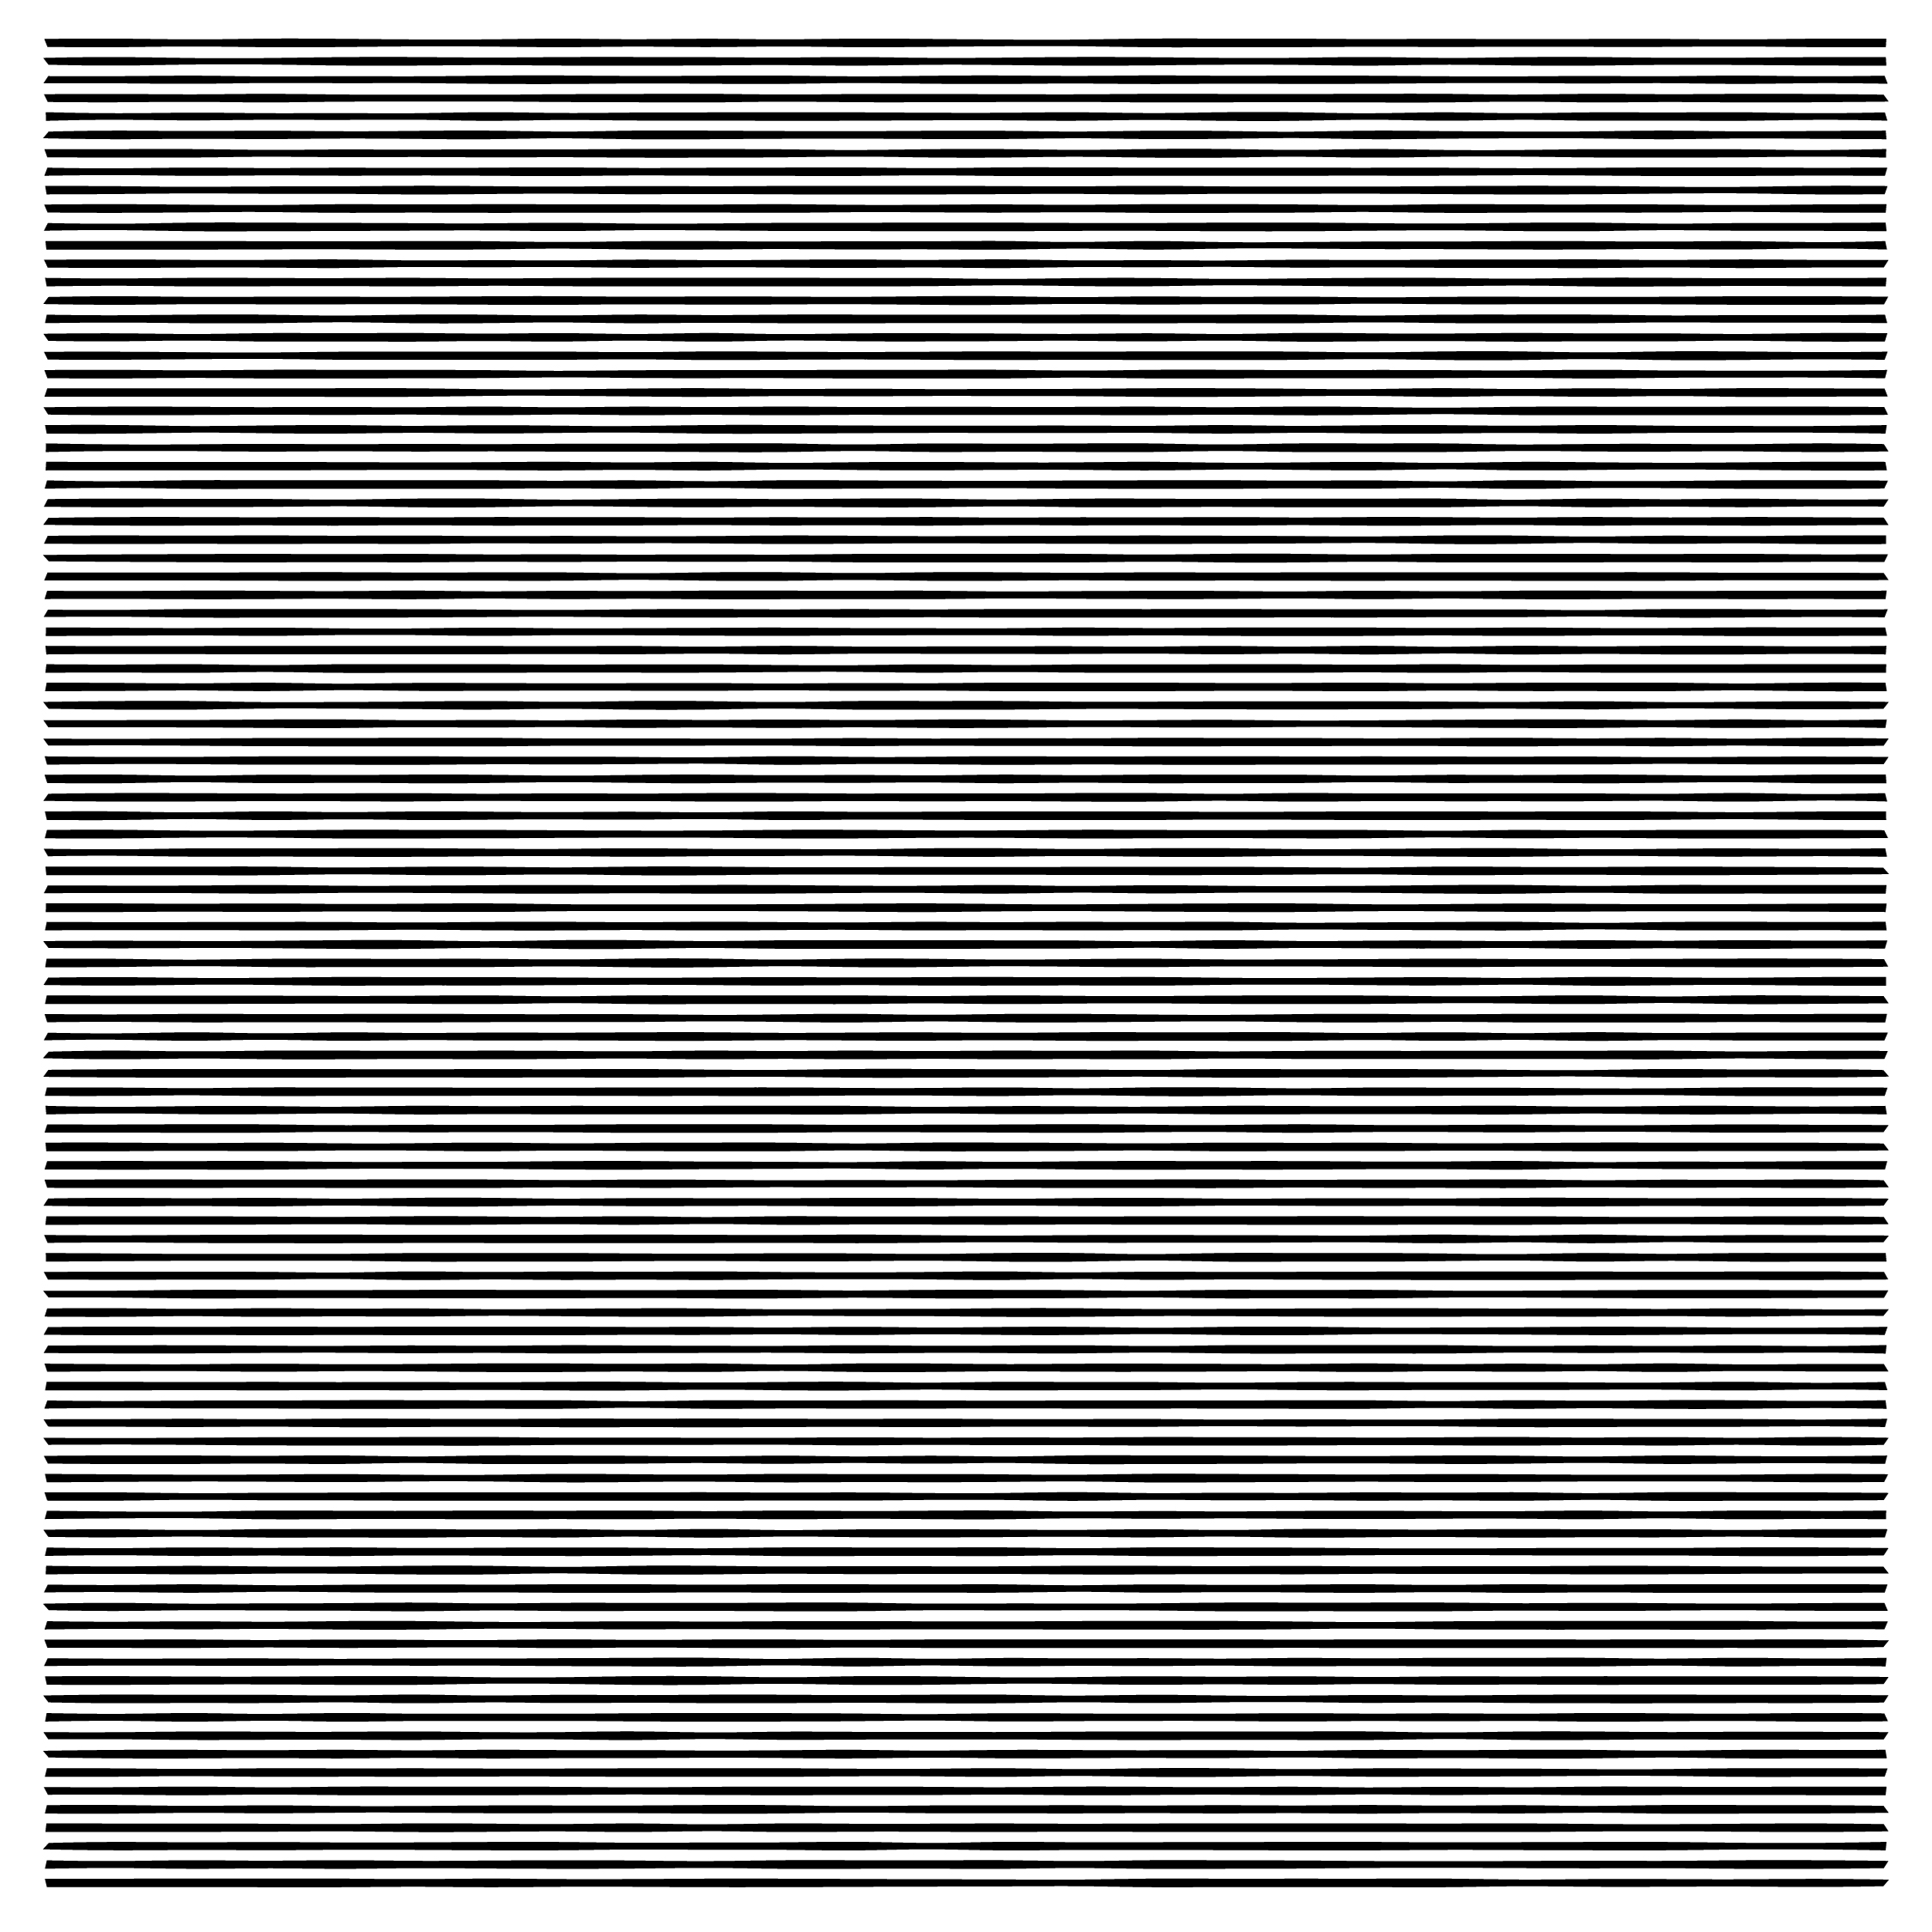 wlines-08.jpg